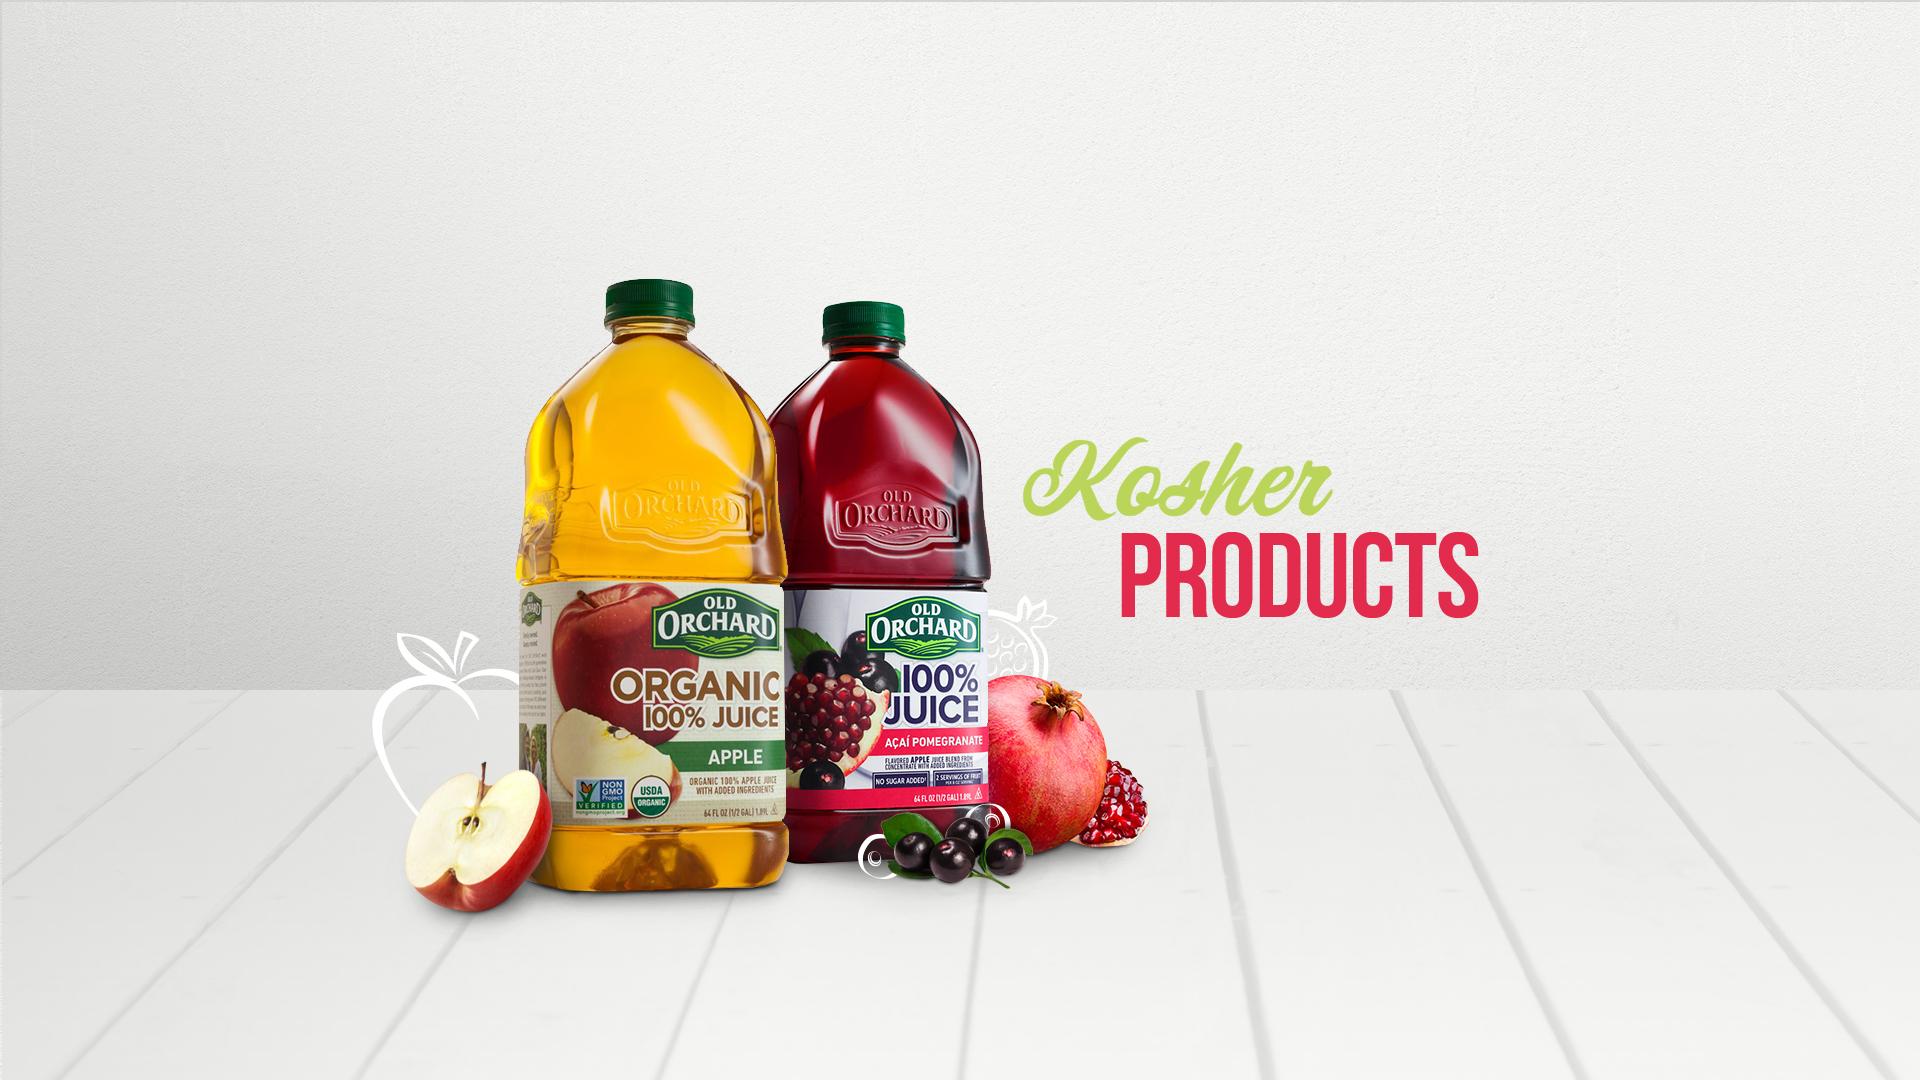 Kosher Products | Old Orchard Brands - 873.9KB